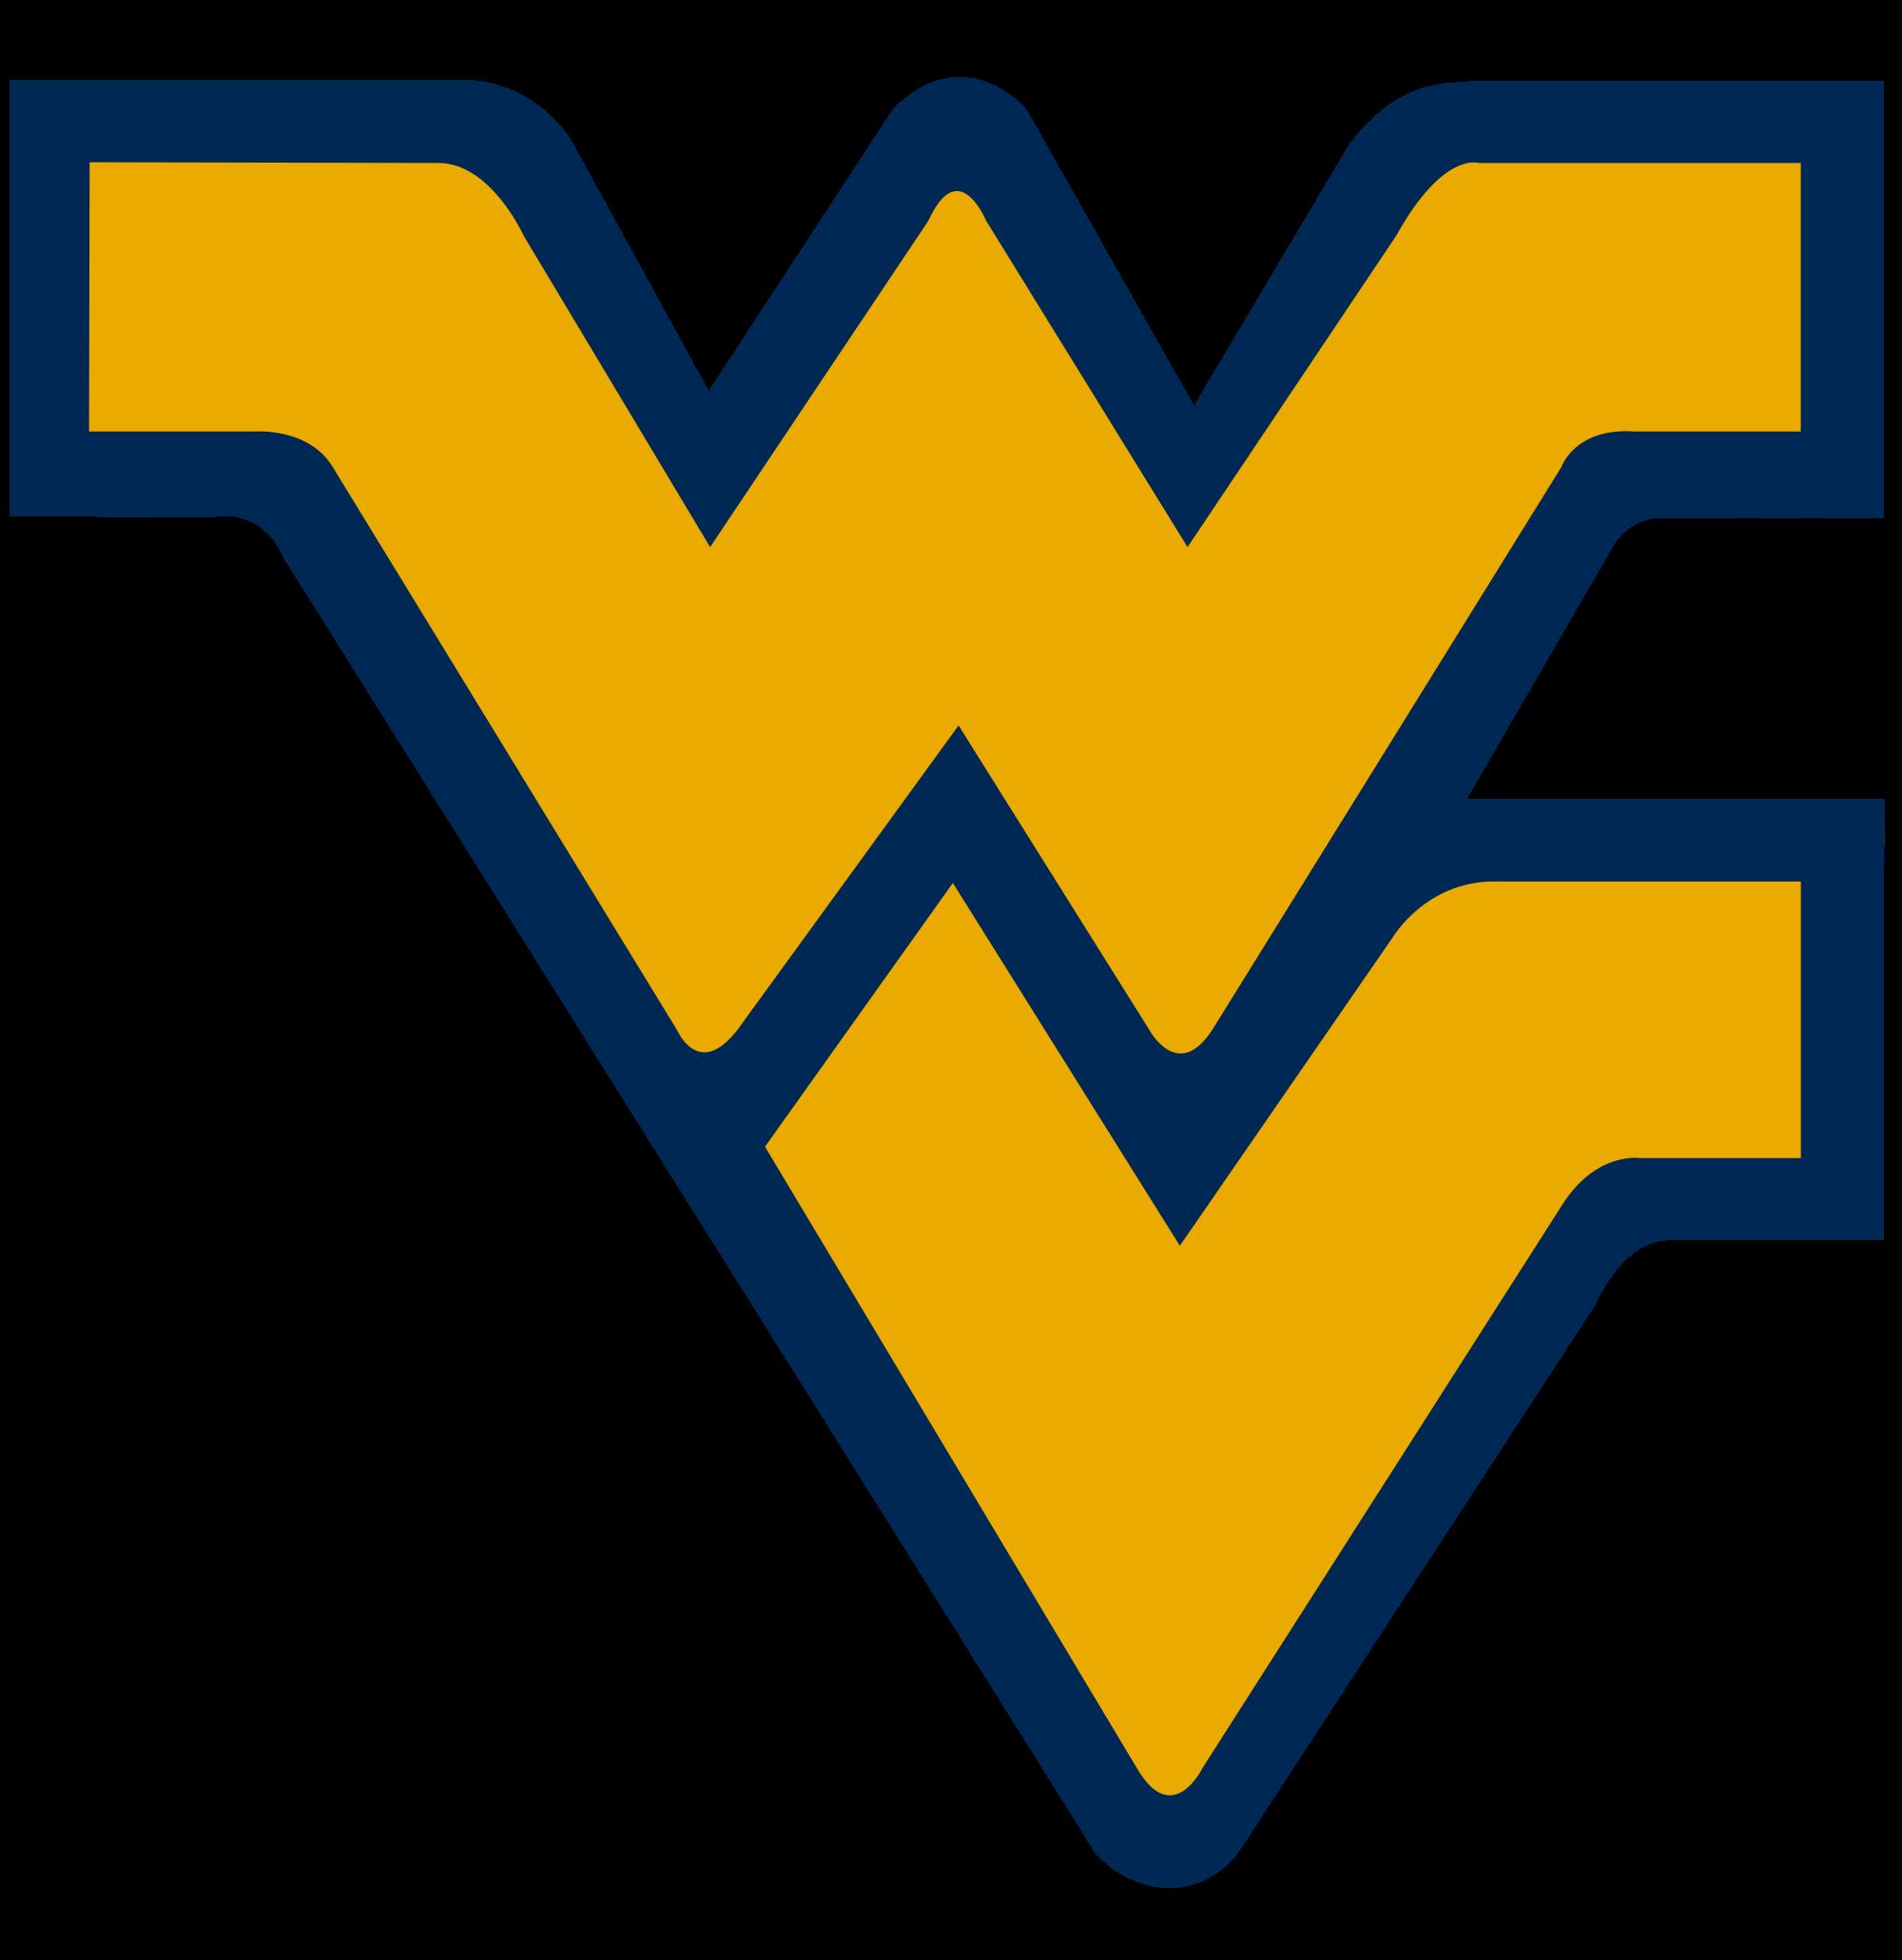 Wvu Mountaineers Logo Wv Logo West Virginia Mountaineers Football West Virginia University [ 2061 x 2000 Pixel ]